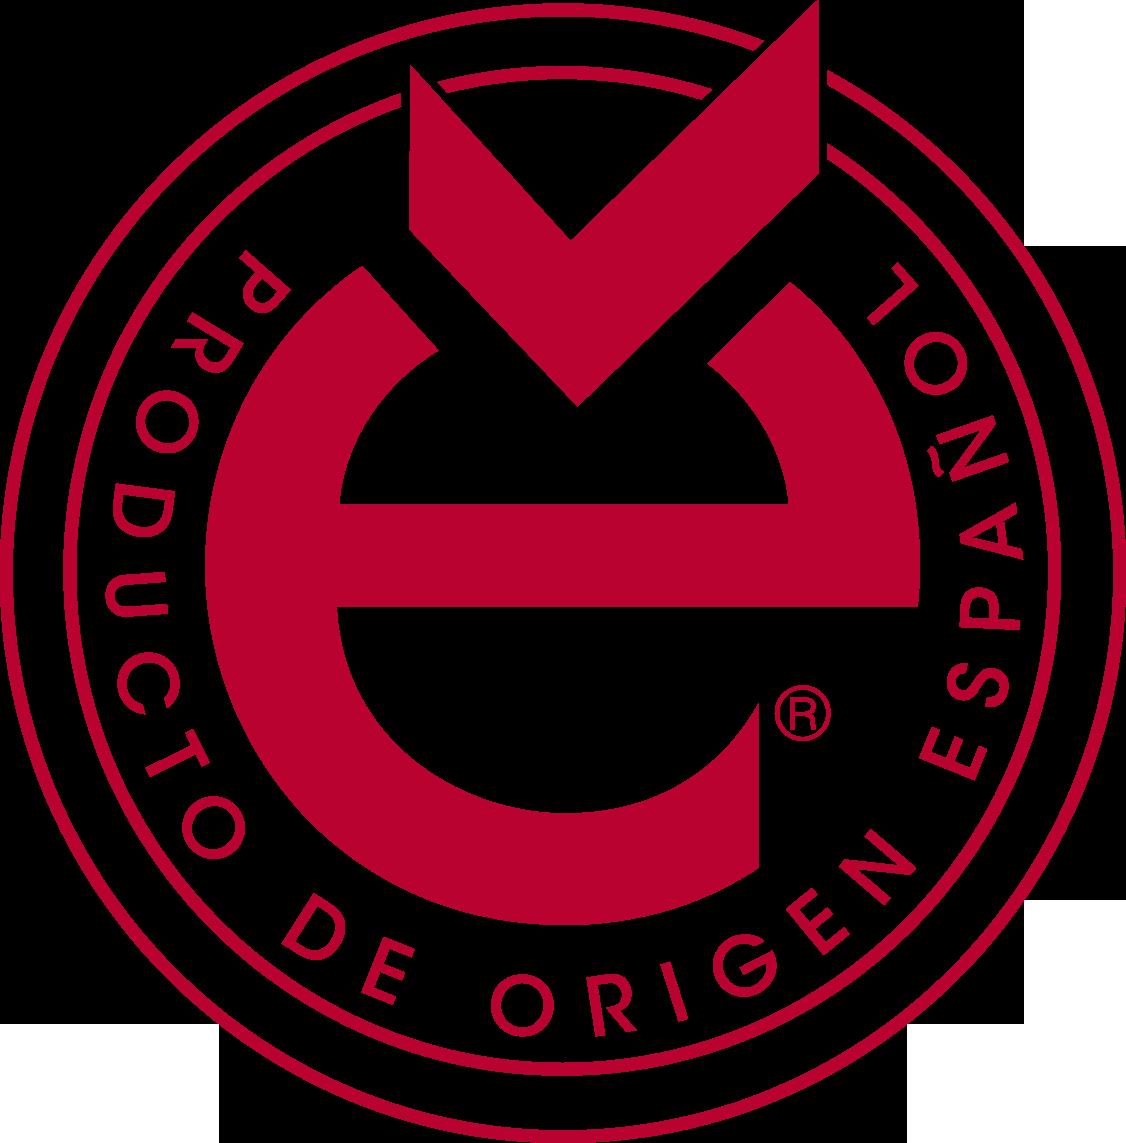 Origen Esàñol